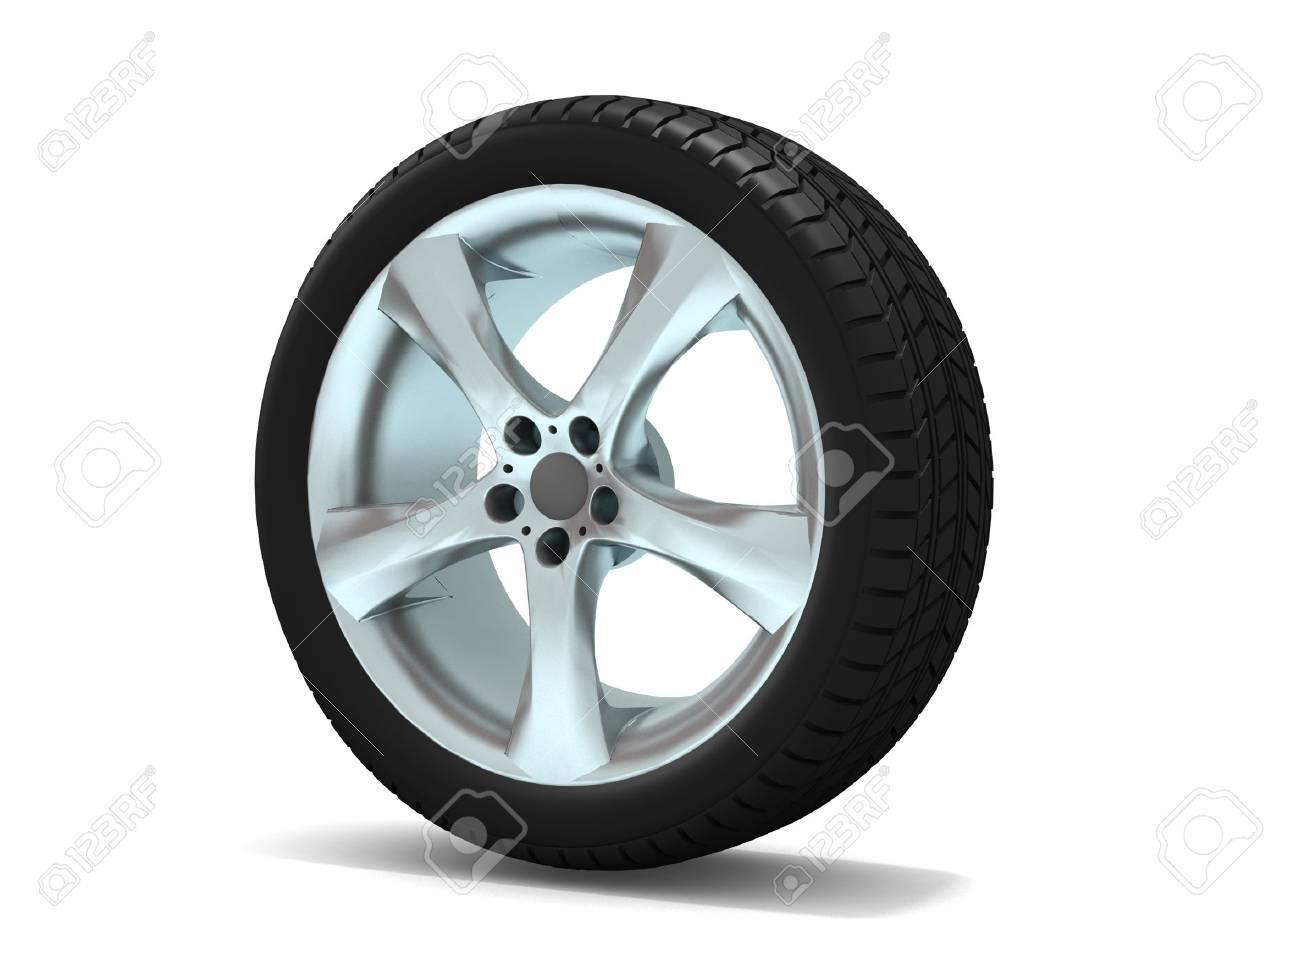 Wheels isolated on white. 3d illustration. Stock Photo - 11047158